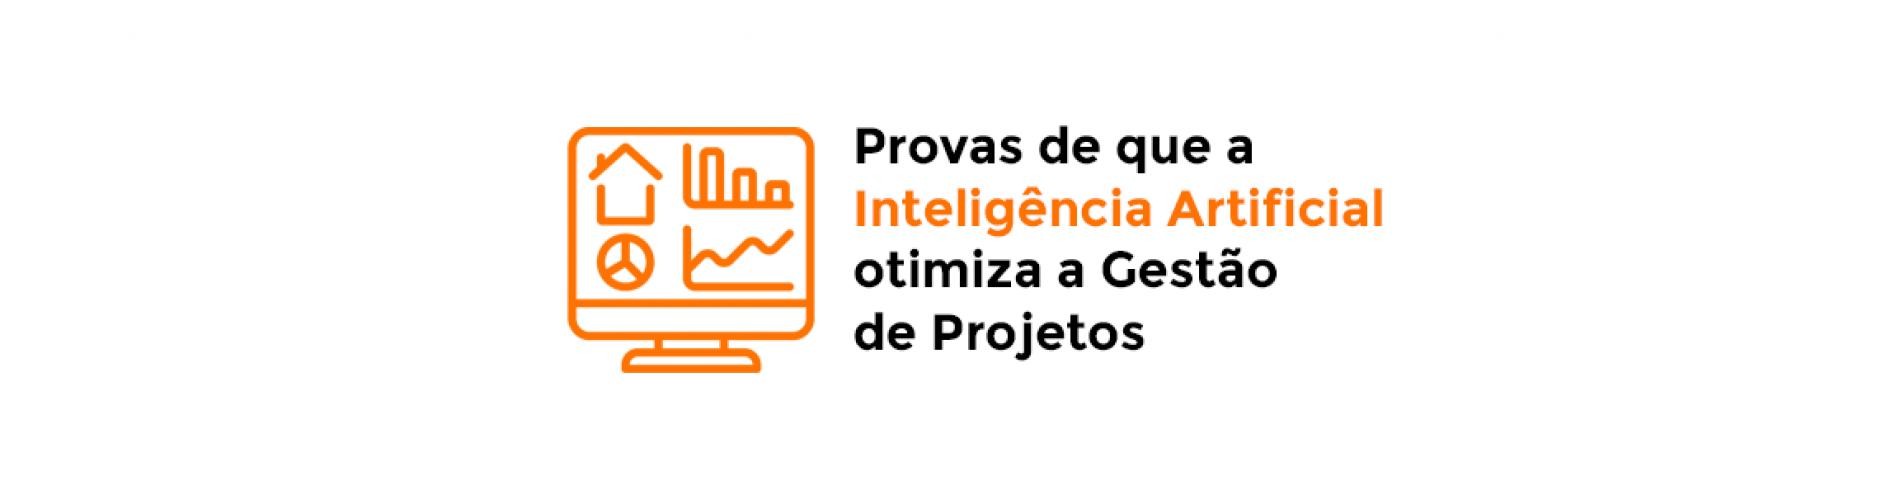 provas-de-que-a-inteligencia-artificial-otimiza-a-gestao-de-projetos